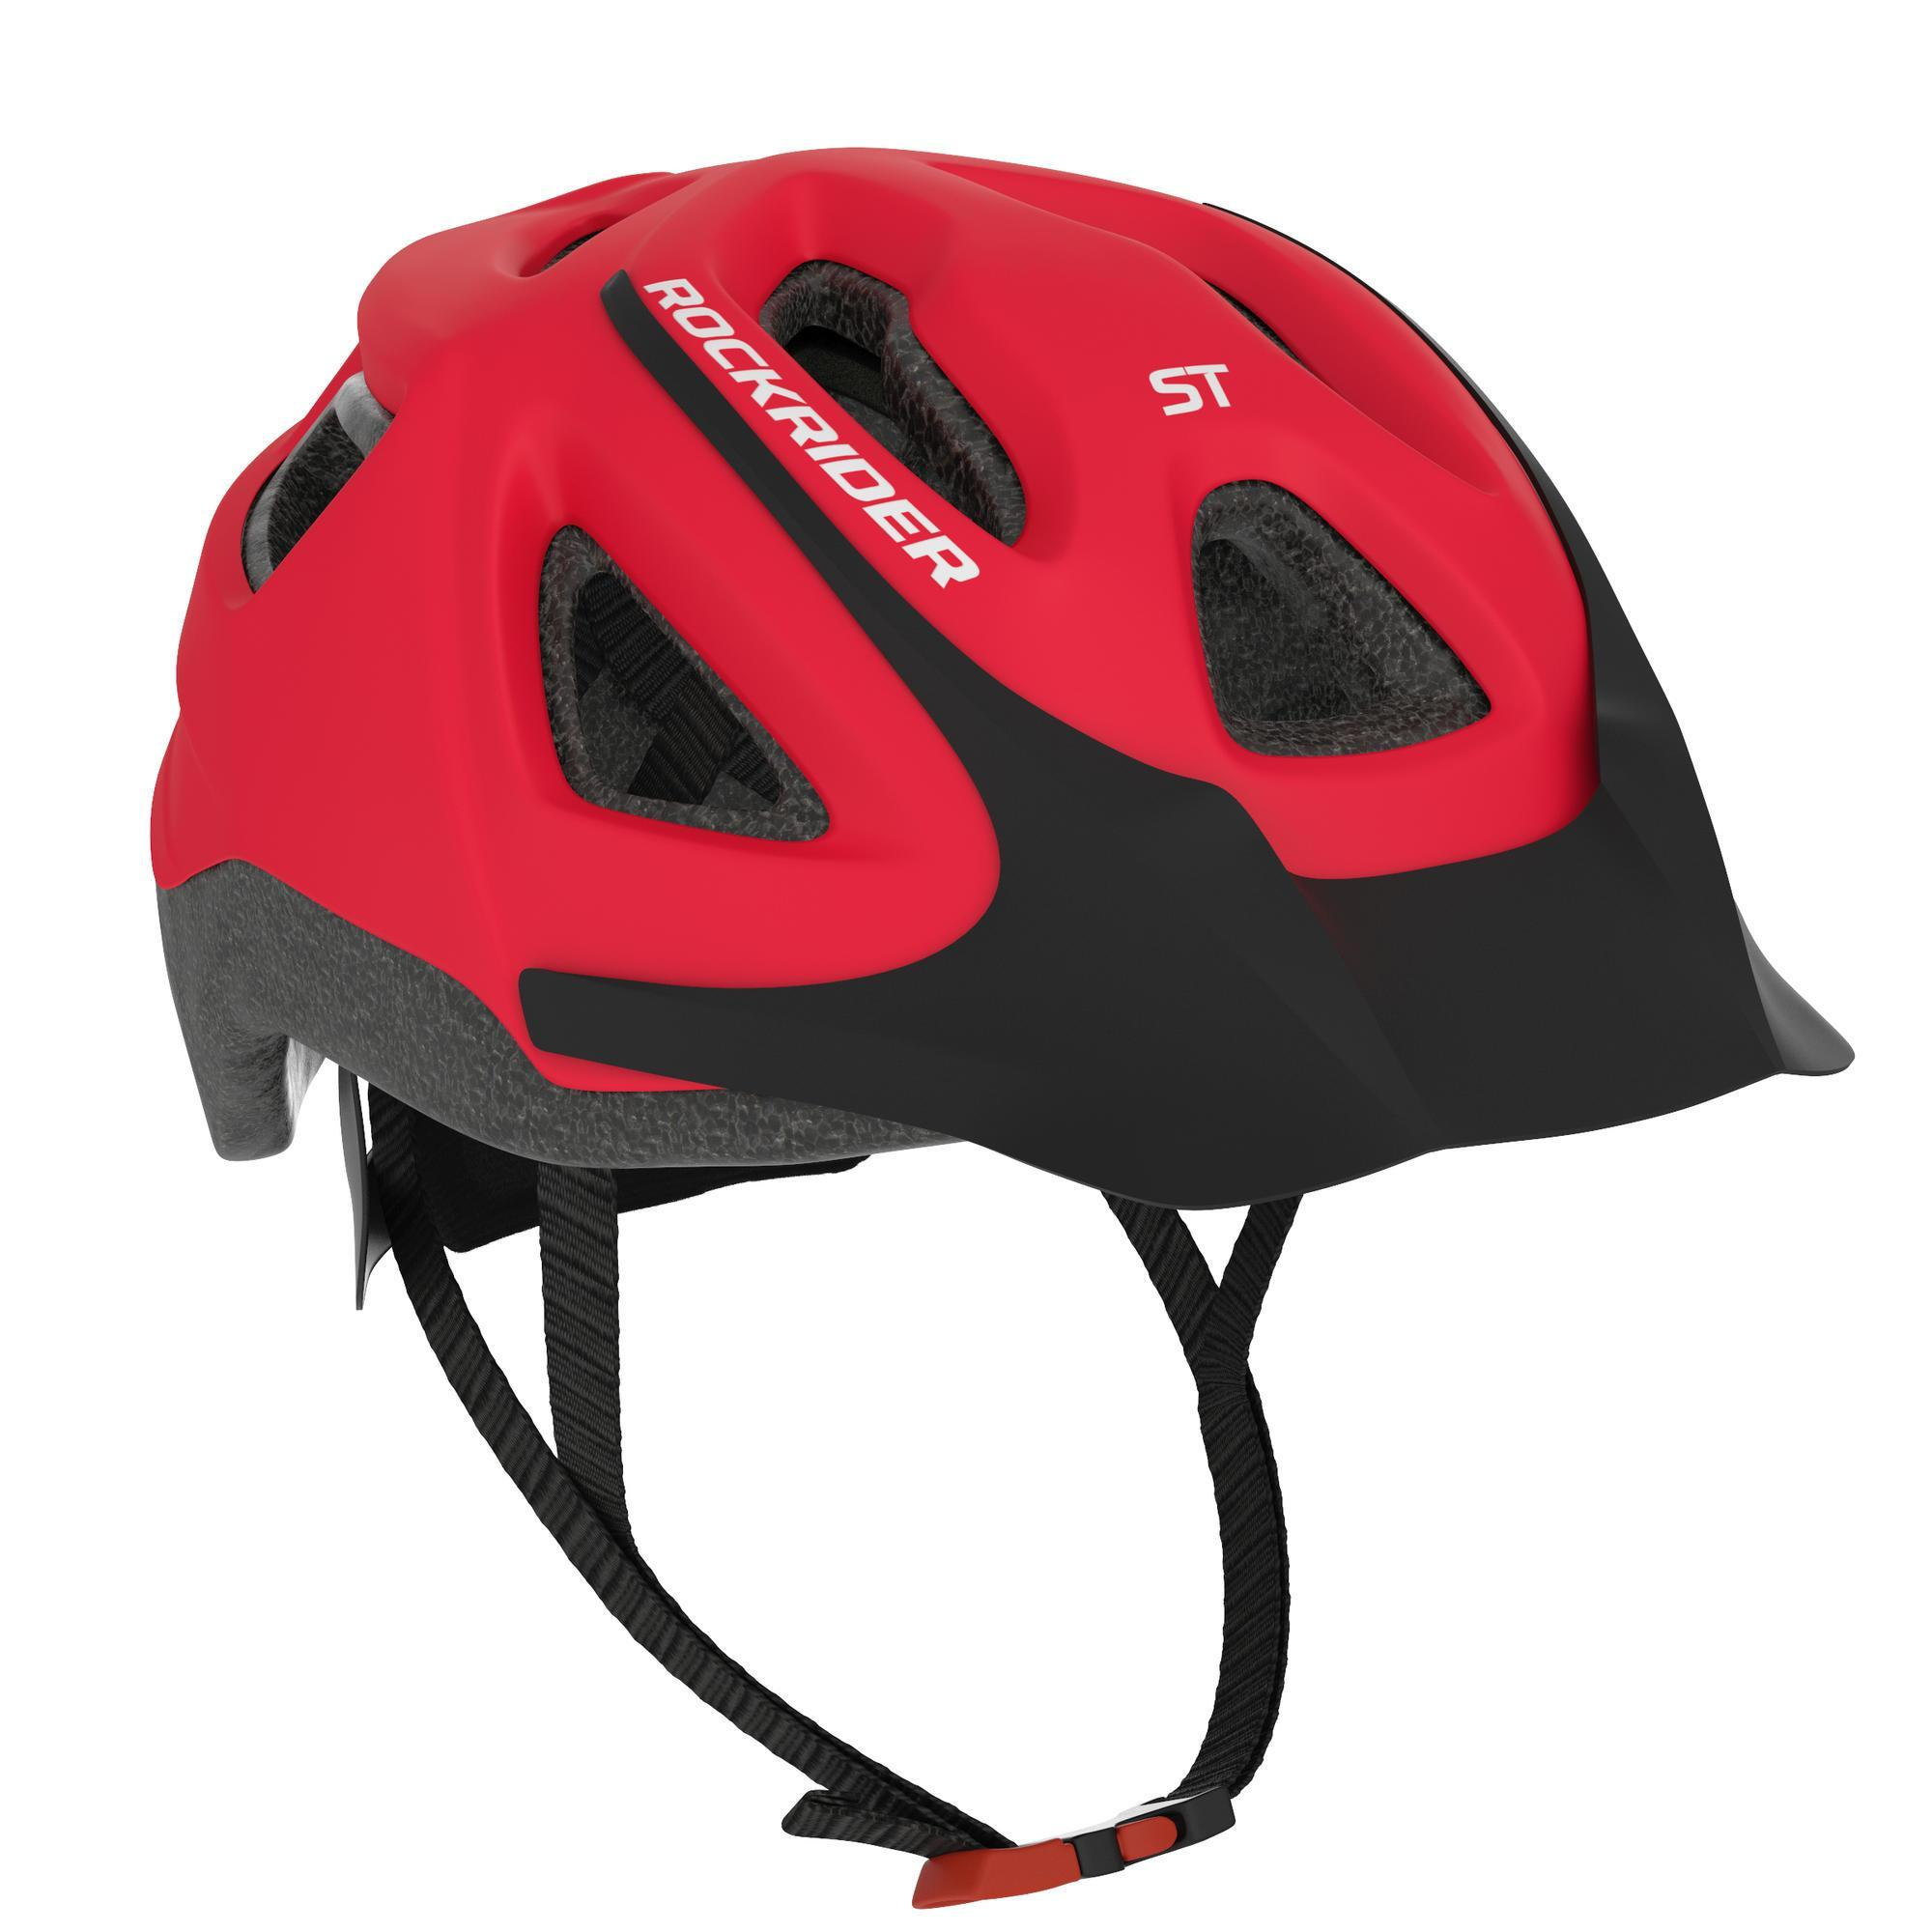 Rockrider Mountainbikehelm ST 100 rood